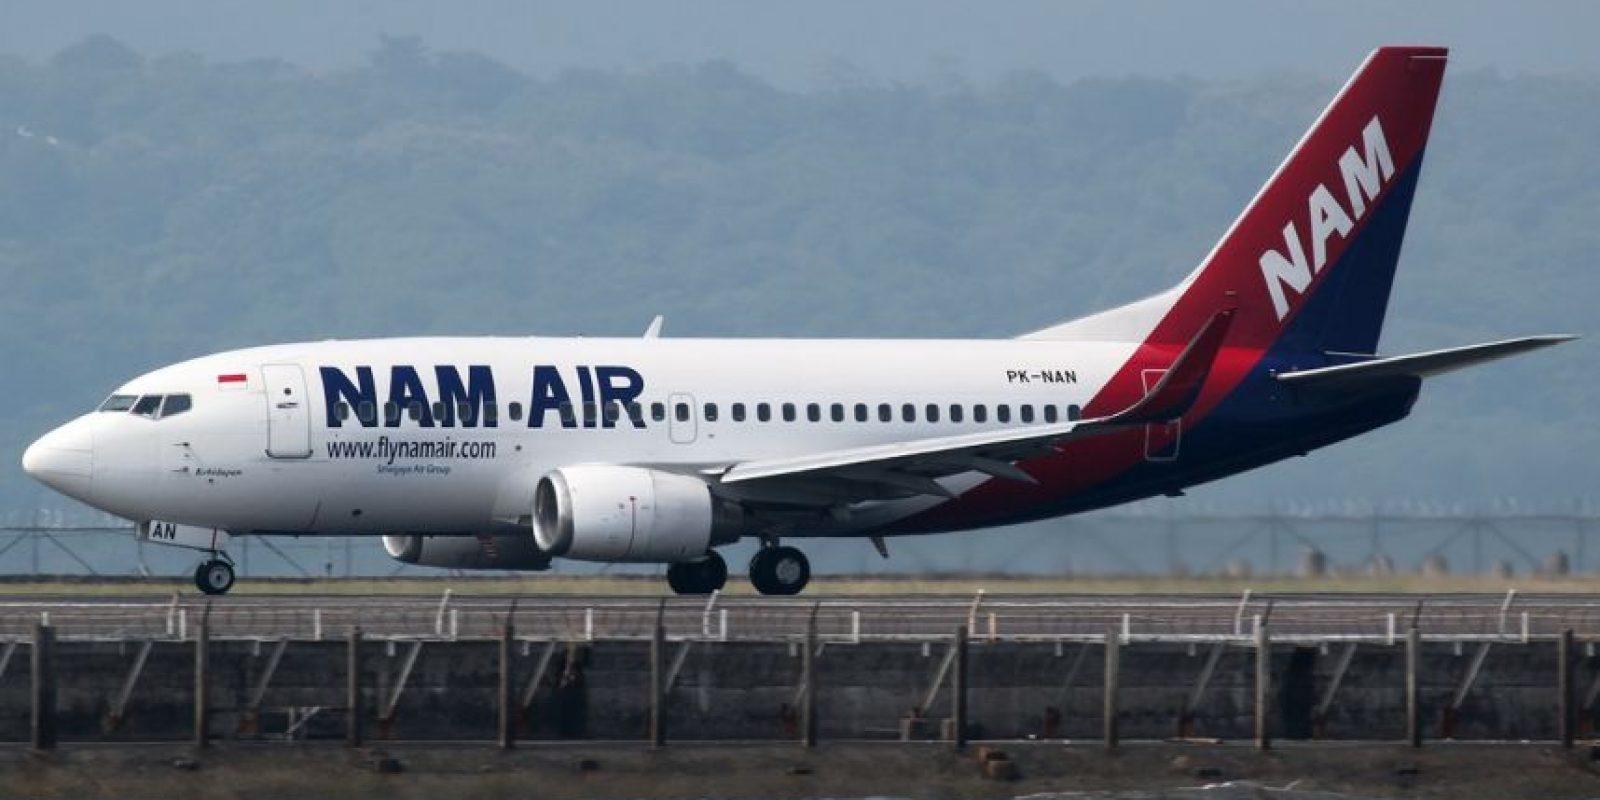 Sriwijaya Air and Nam Air Foto:Wikipedia.org